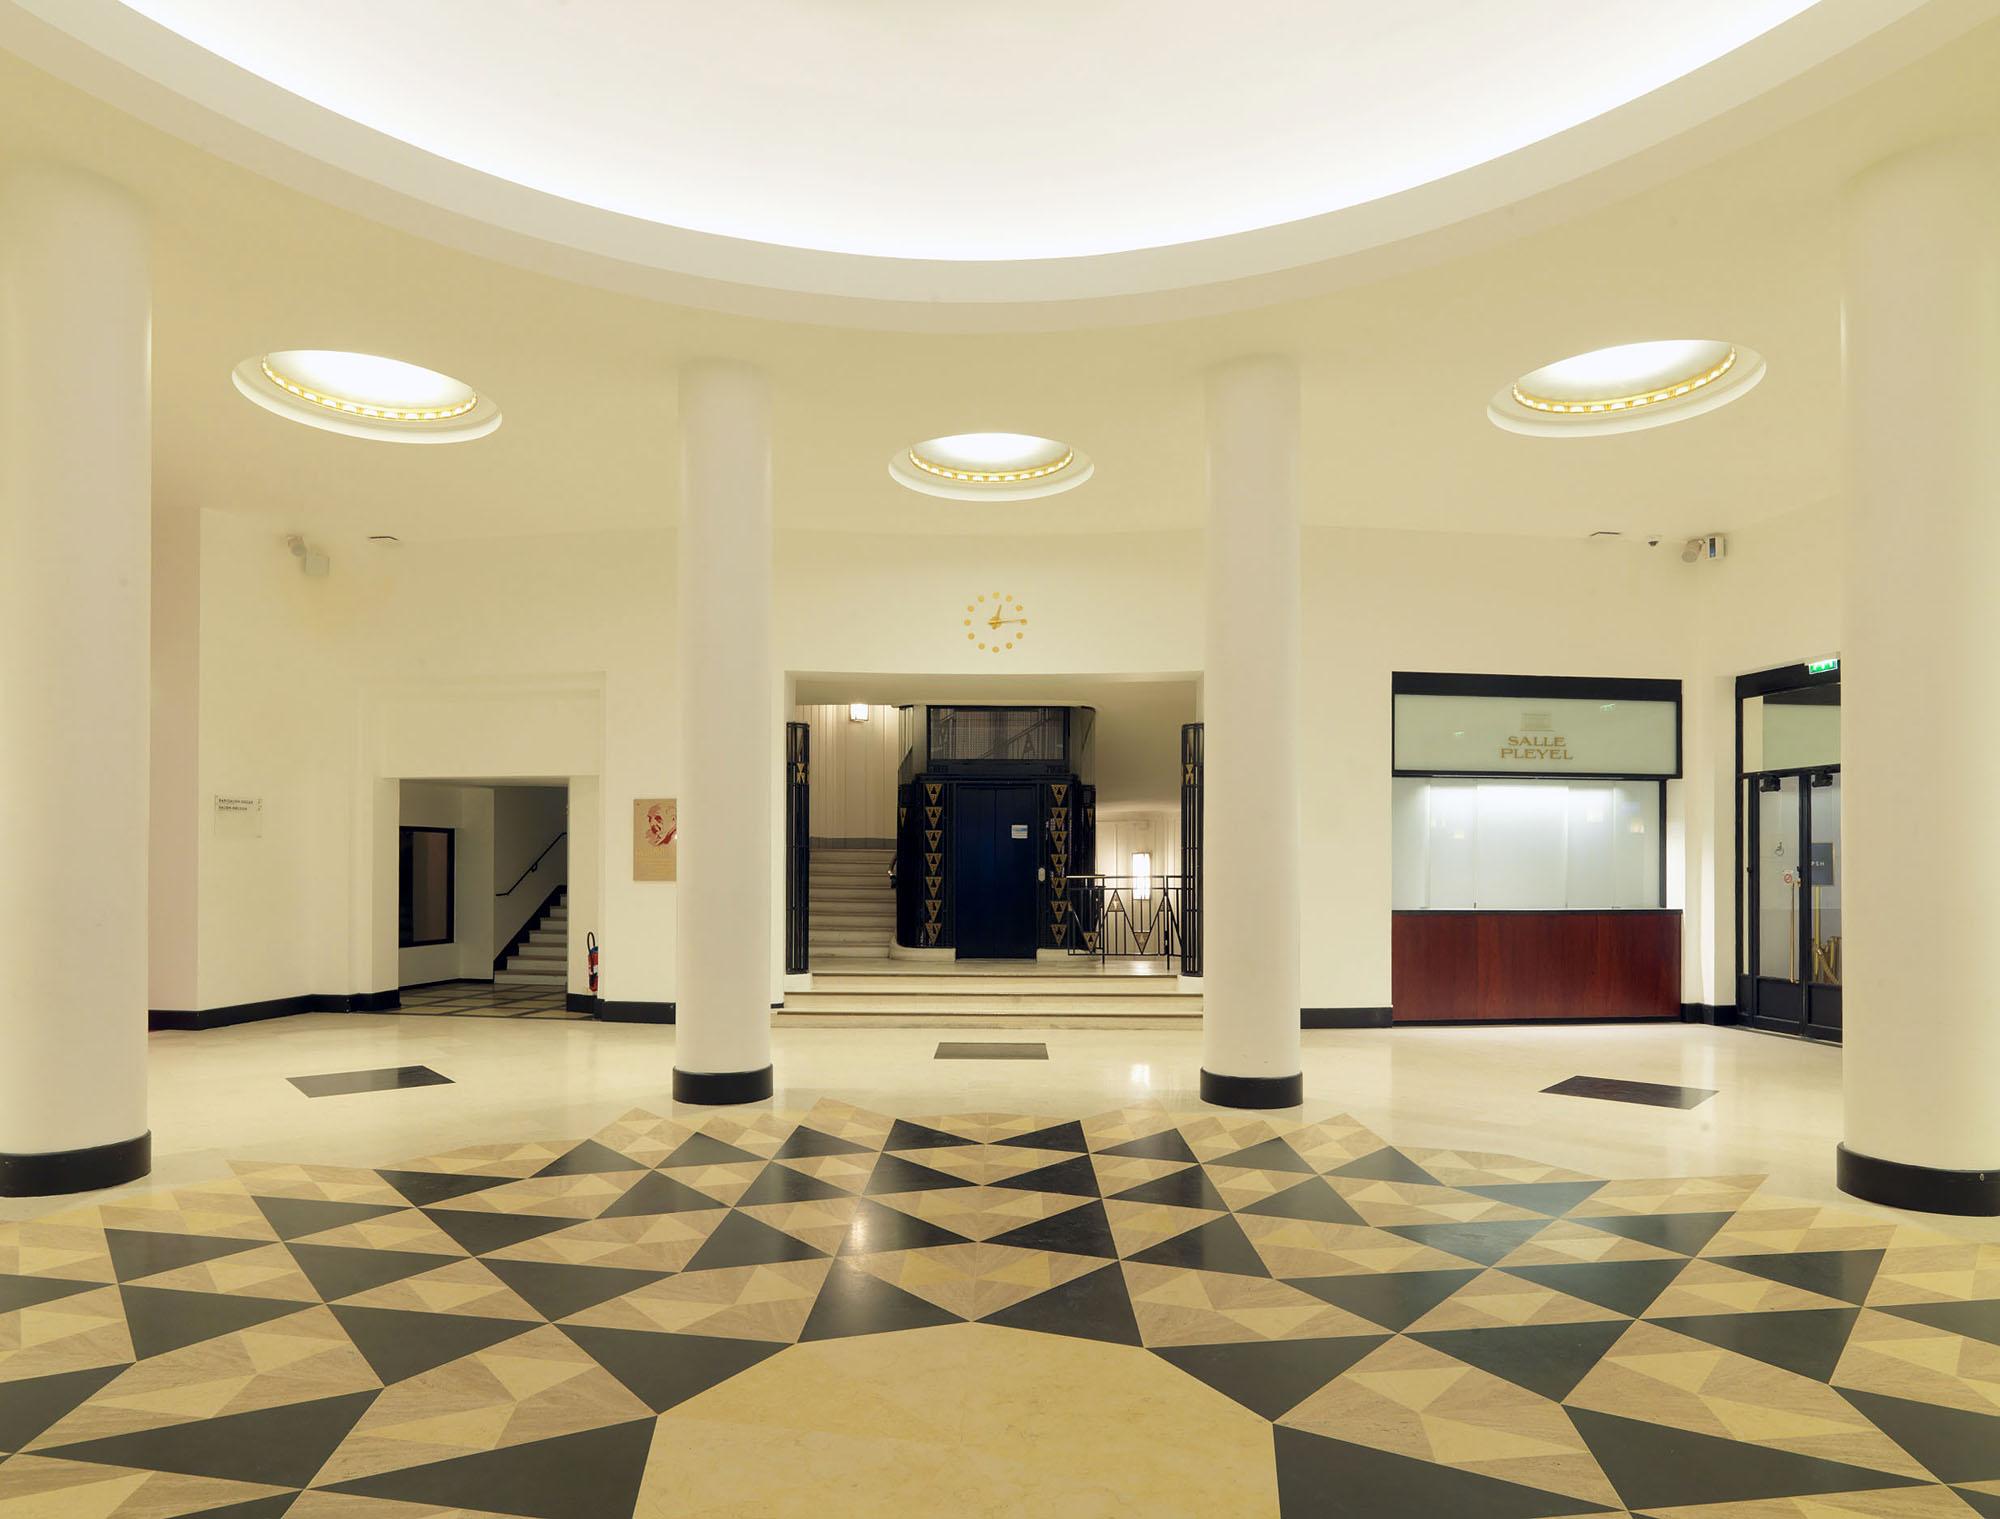 Salle Pleyel Paris